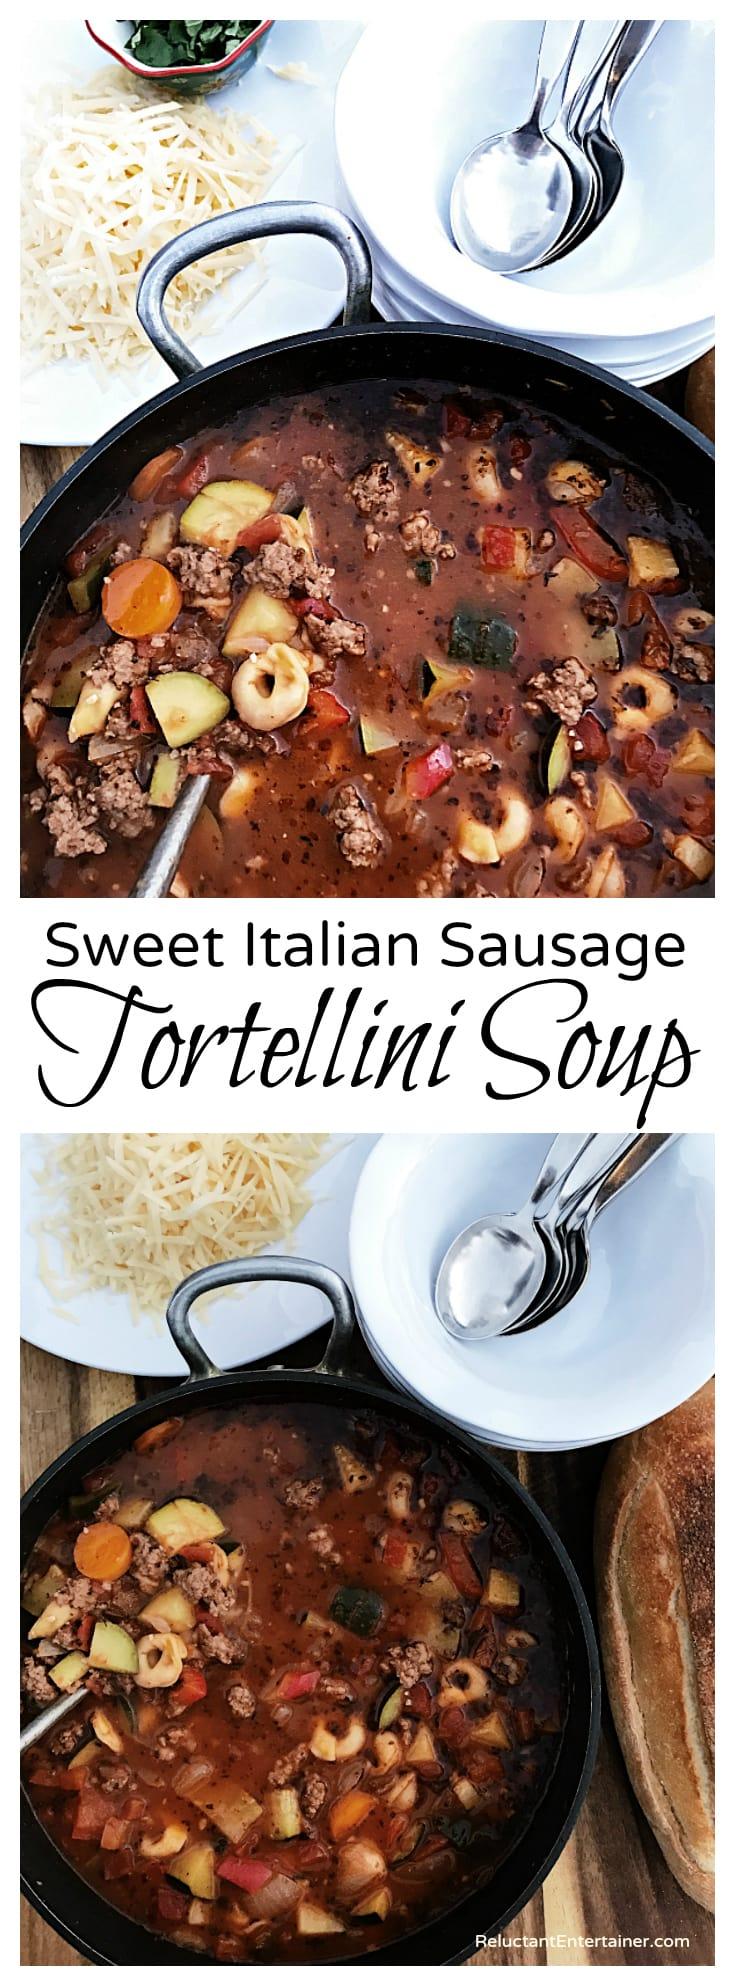 Sweet Italian Sausage Tortellini Soup Recipe Reluctant